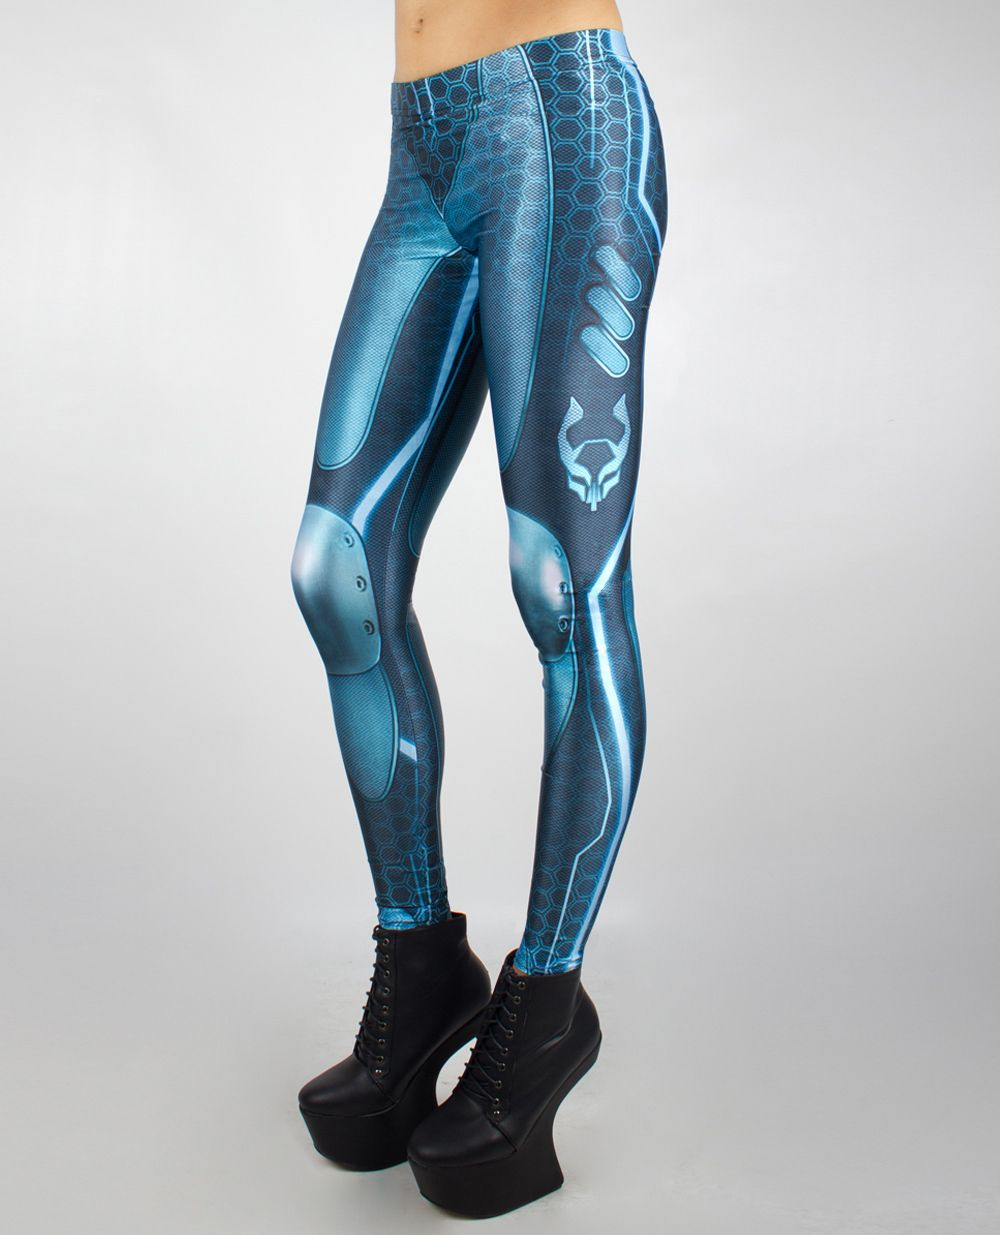 CyberPunk Leggings Organic Cotton Pants Alternative Fashion OFFRANDES High Waist Mesh Tights